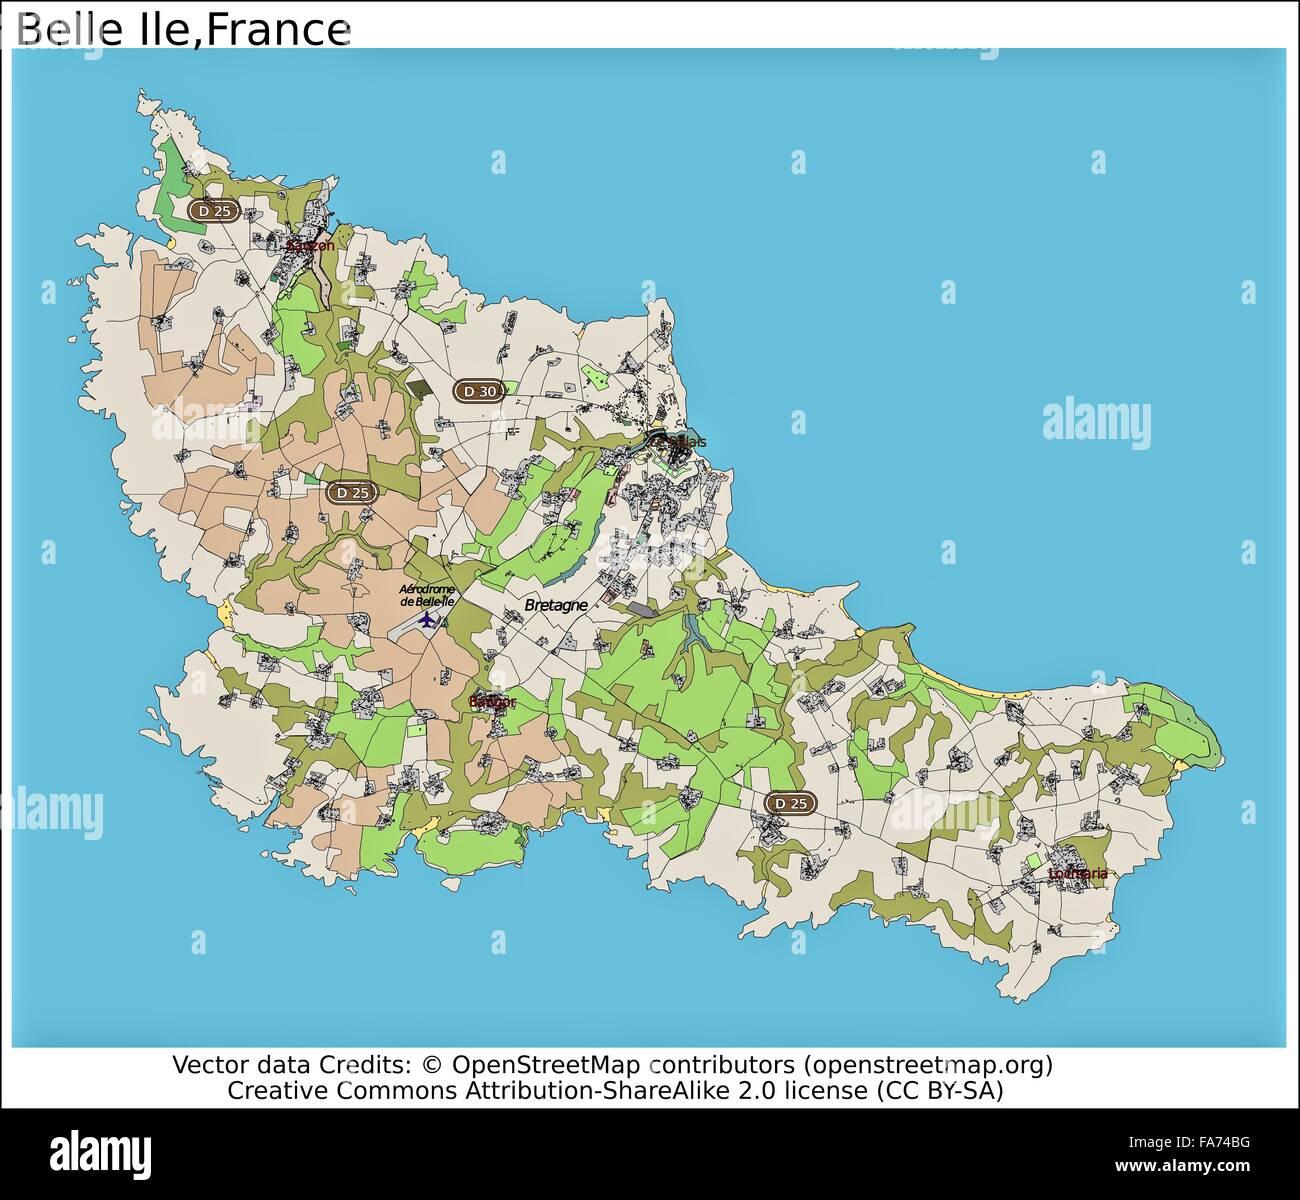 Belle Ile France location map Stock Photo 92355524 Alamy